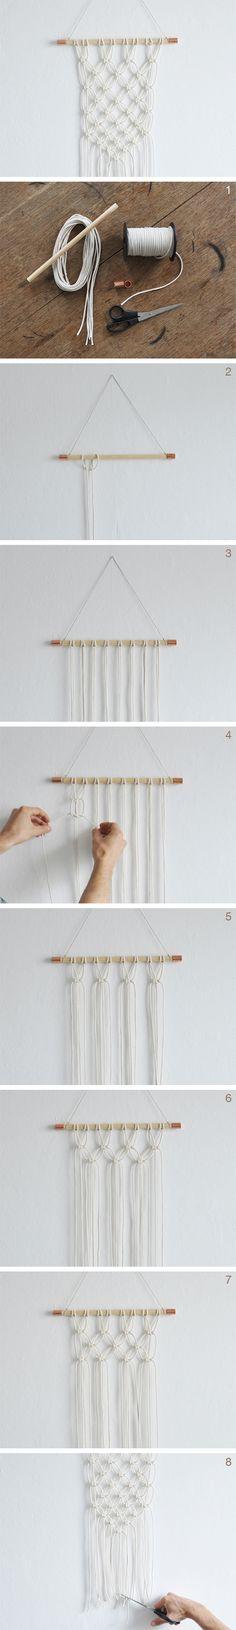 kostenlose DIY Anleitung: DIY: Makramee Wandteppich knüpfen // free DIY tutorial: how to make a macrame wall hanging via DaWanda.com